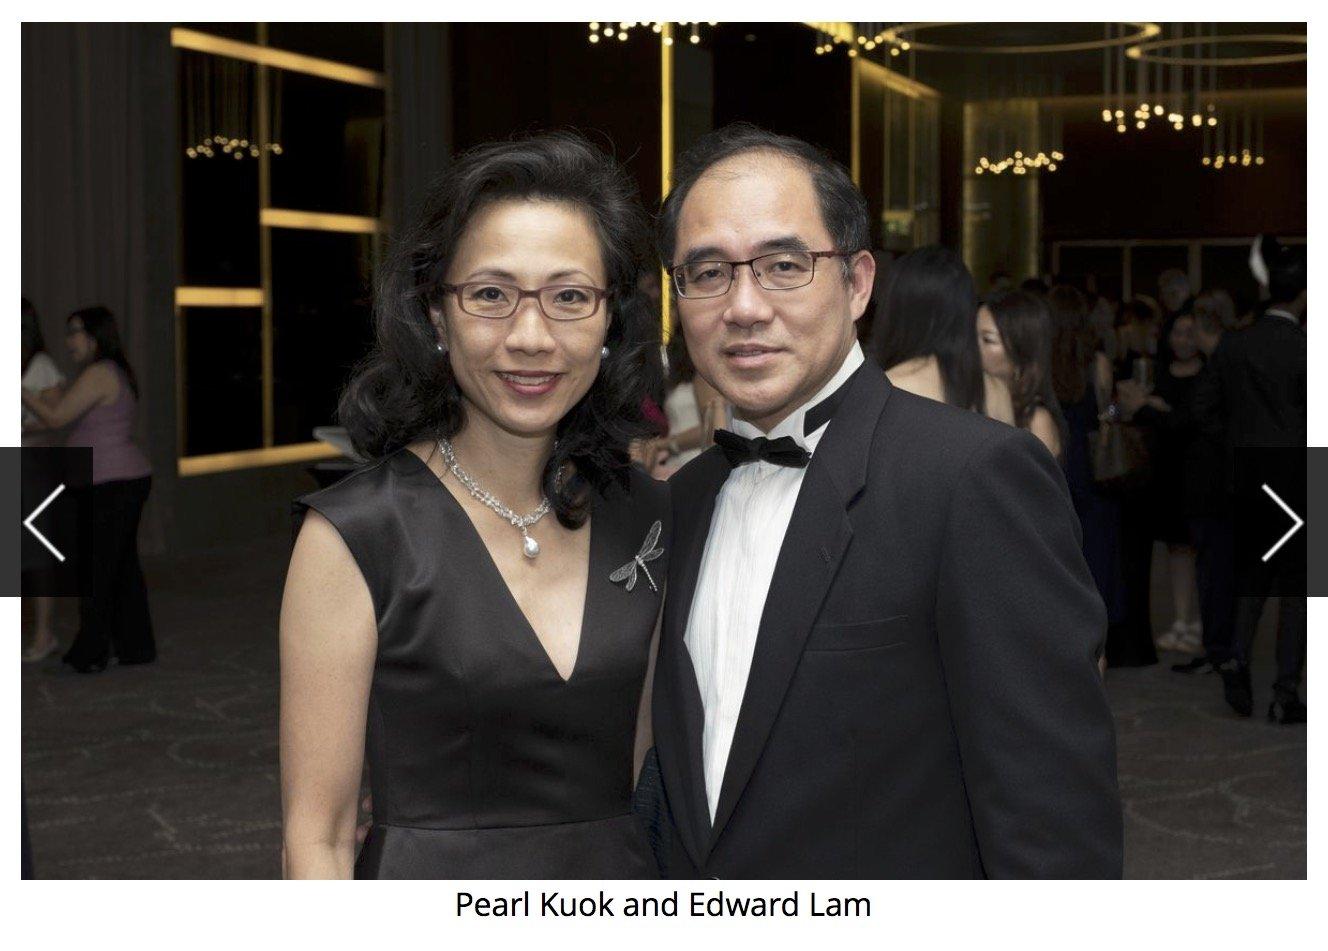 Luxury Insider asia magazine Jose Jeuland photographer event concert star celebrities photography